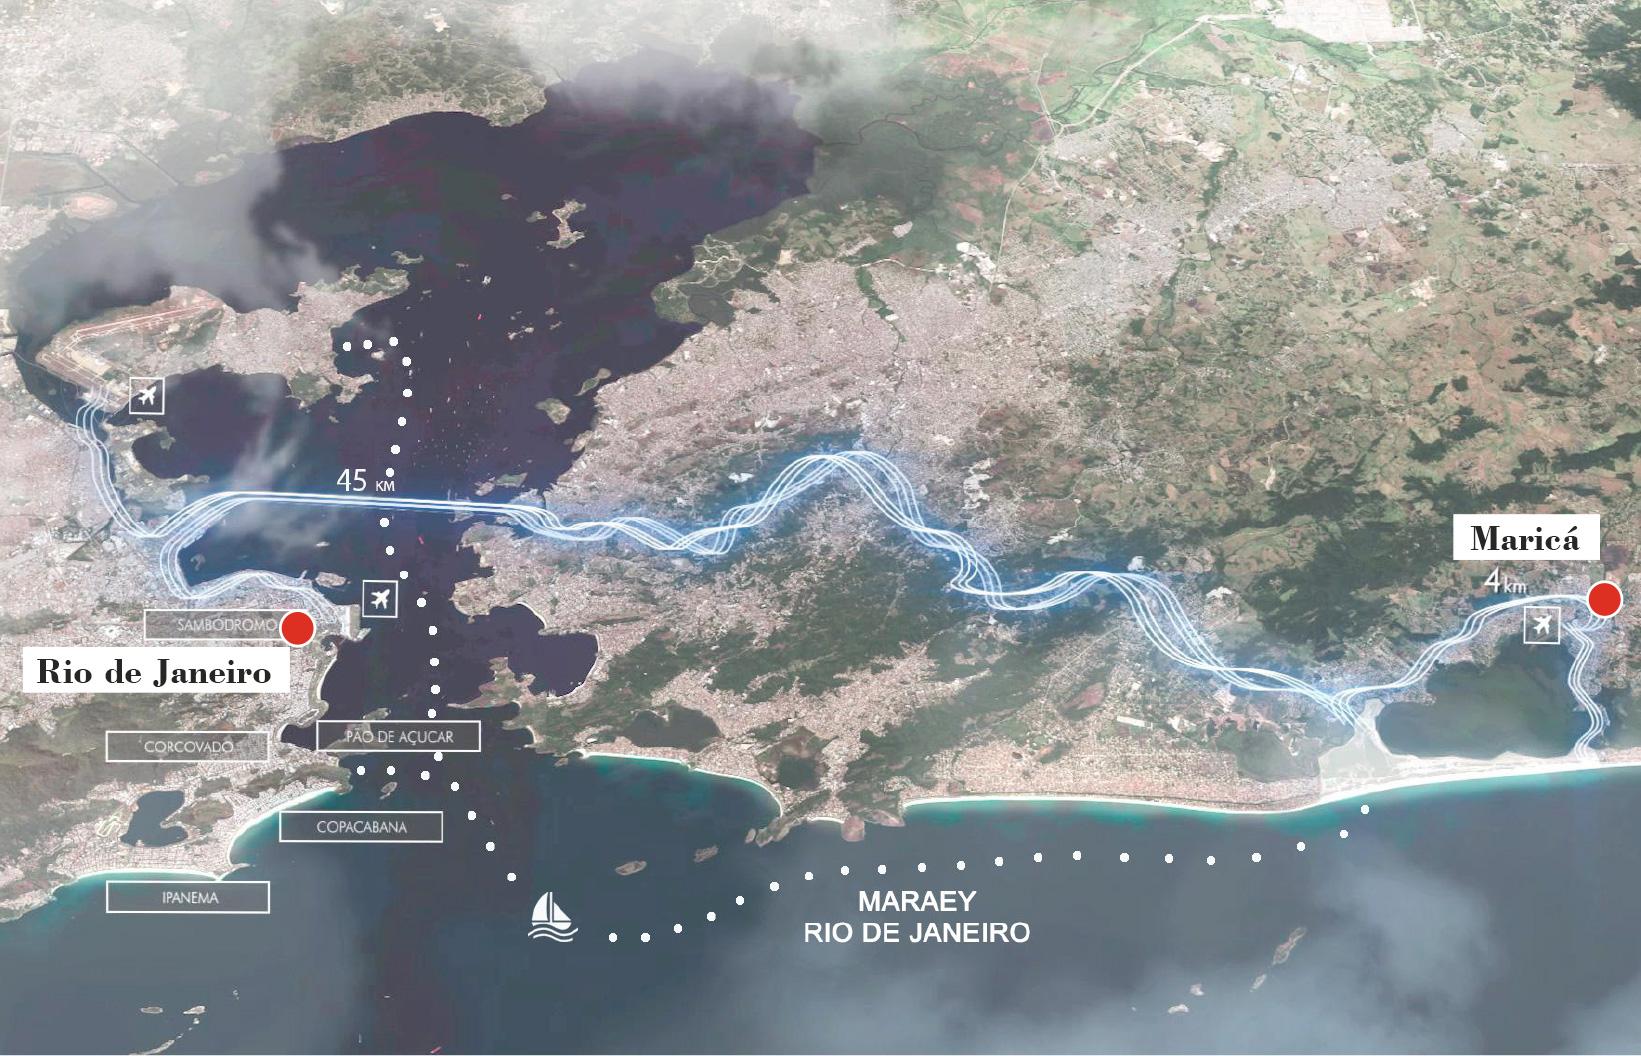 Proximity of MARAEY project to Rio de Janeiro